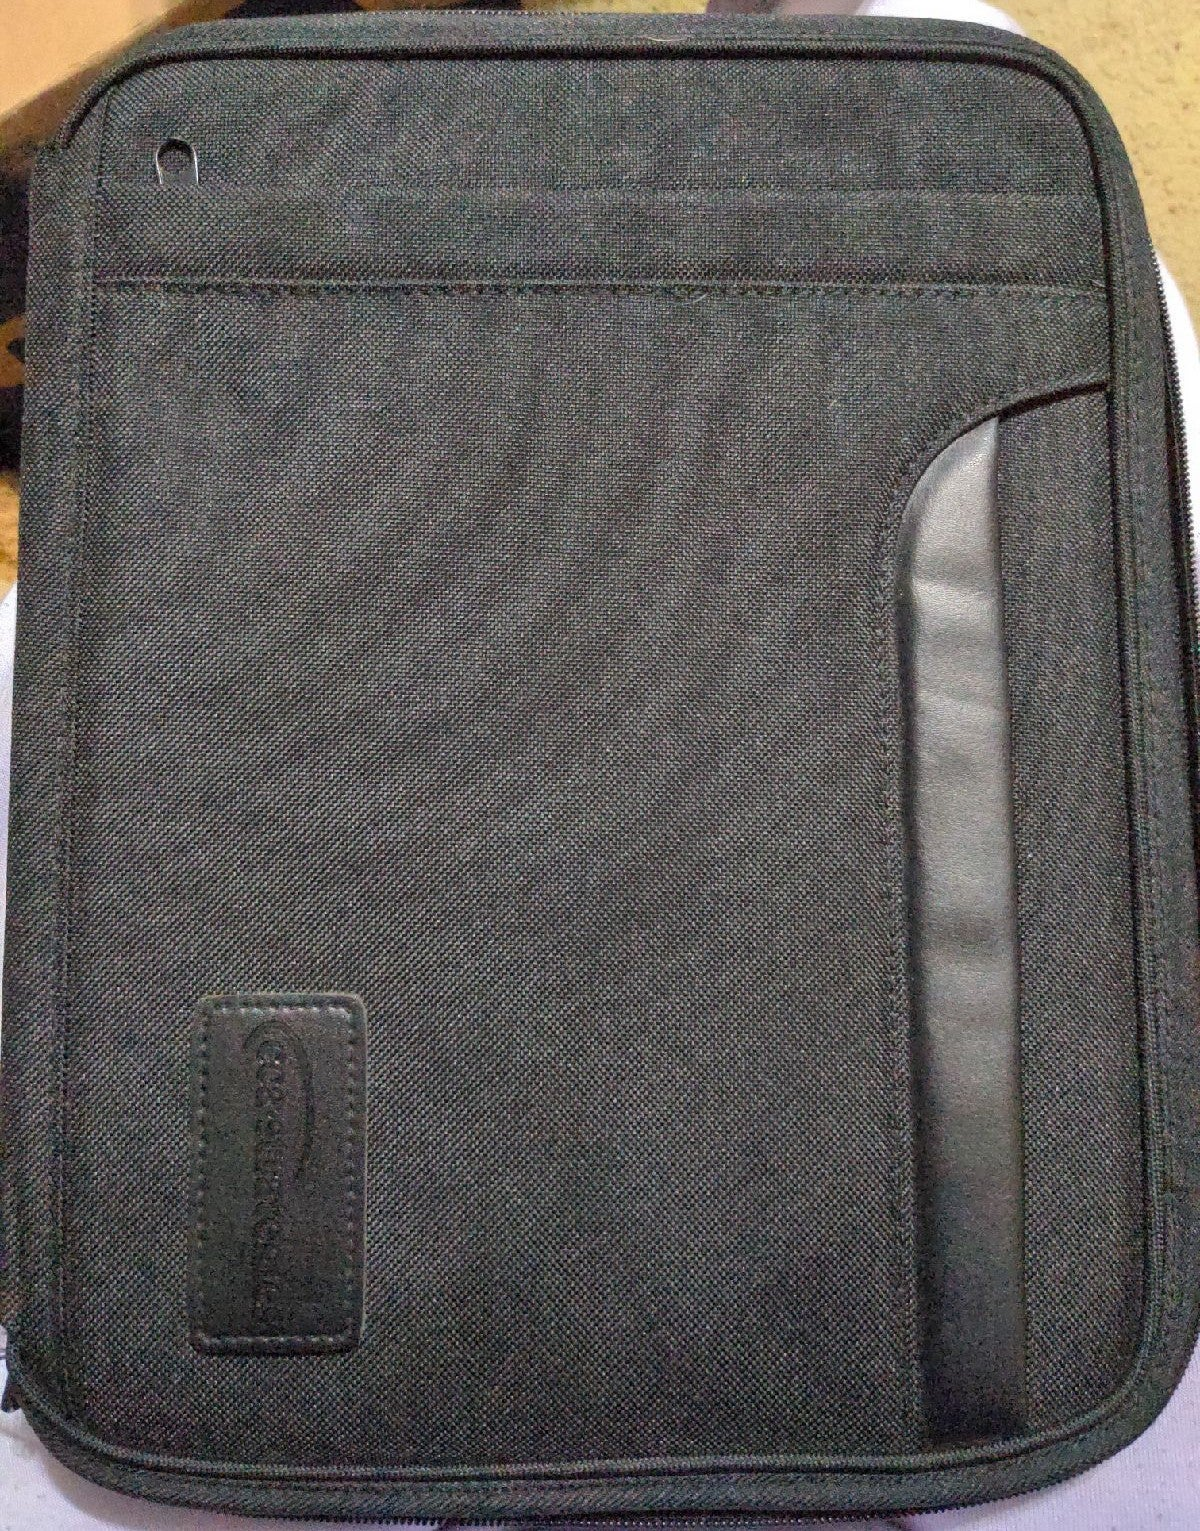 Black Laptop case 12inx9in